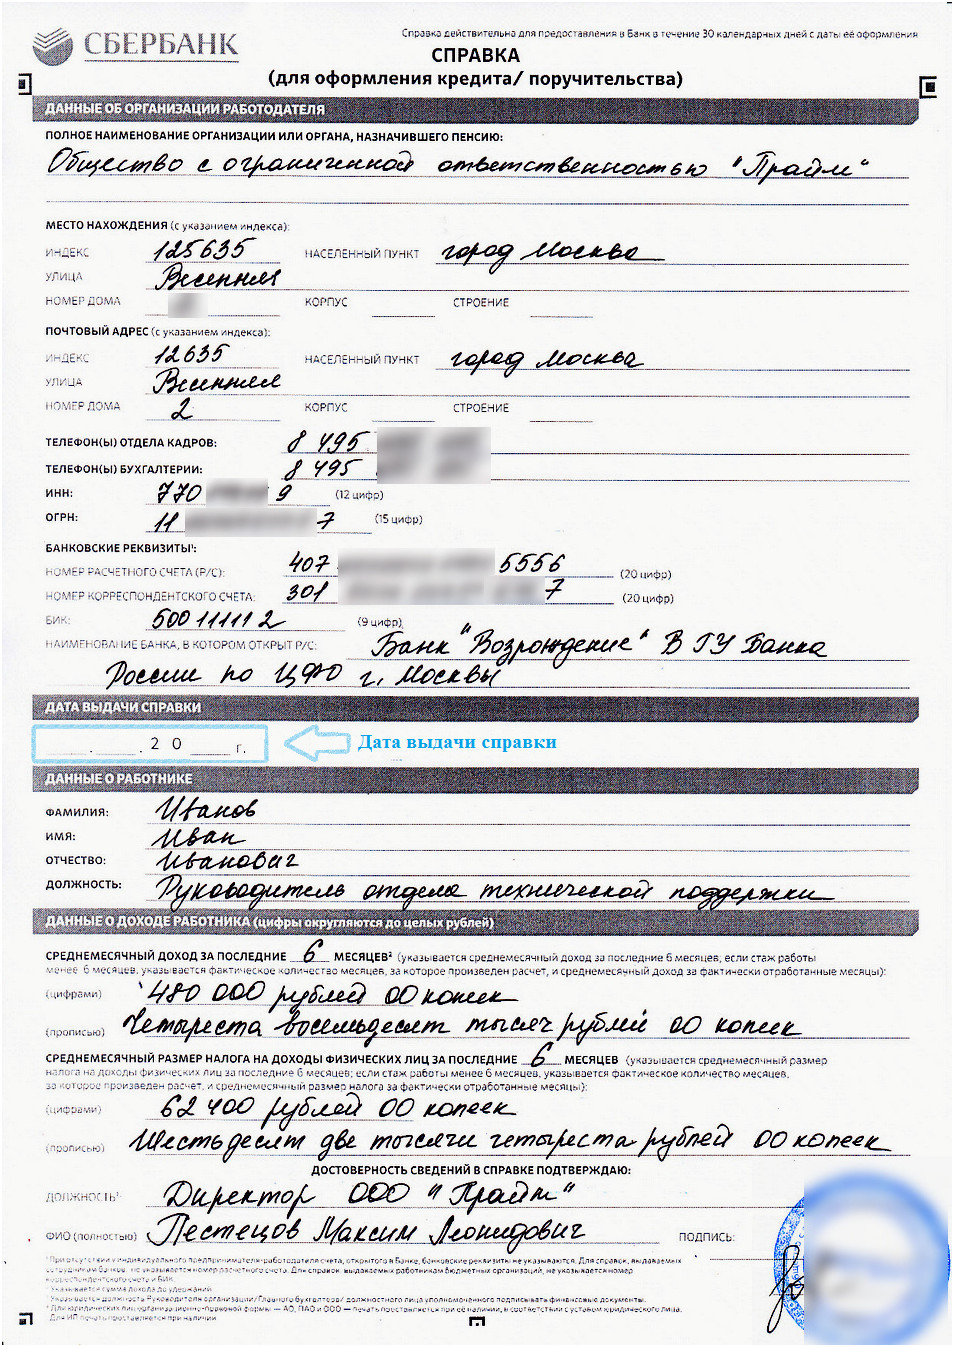 Справка по форме СберБанка для ипотеки